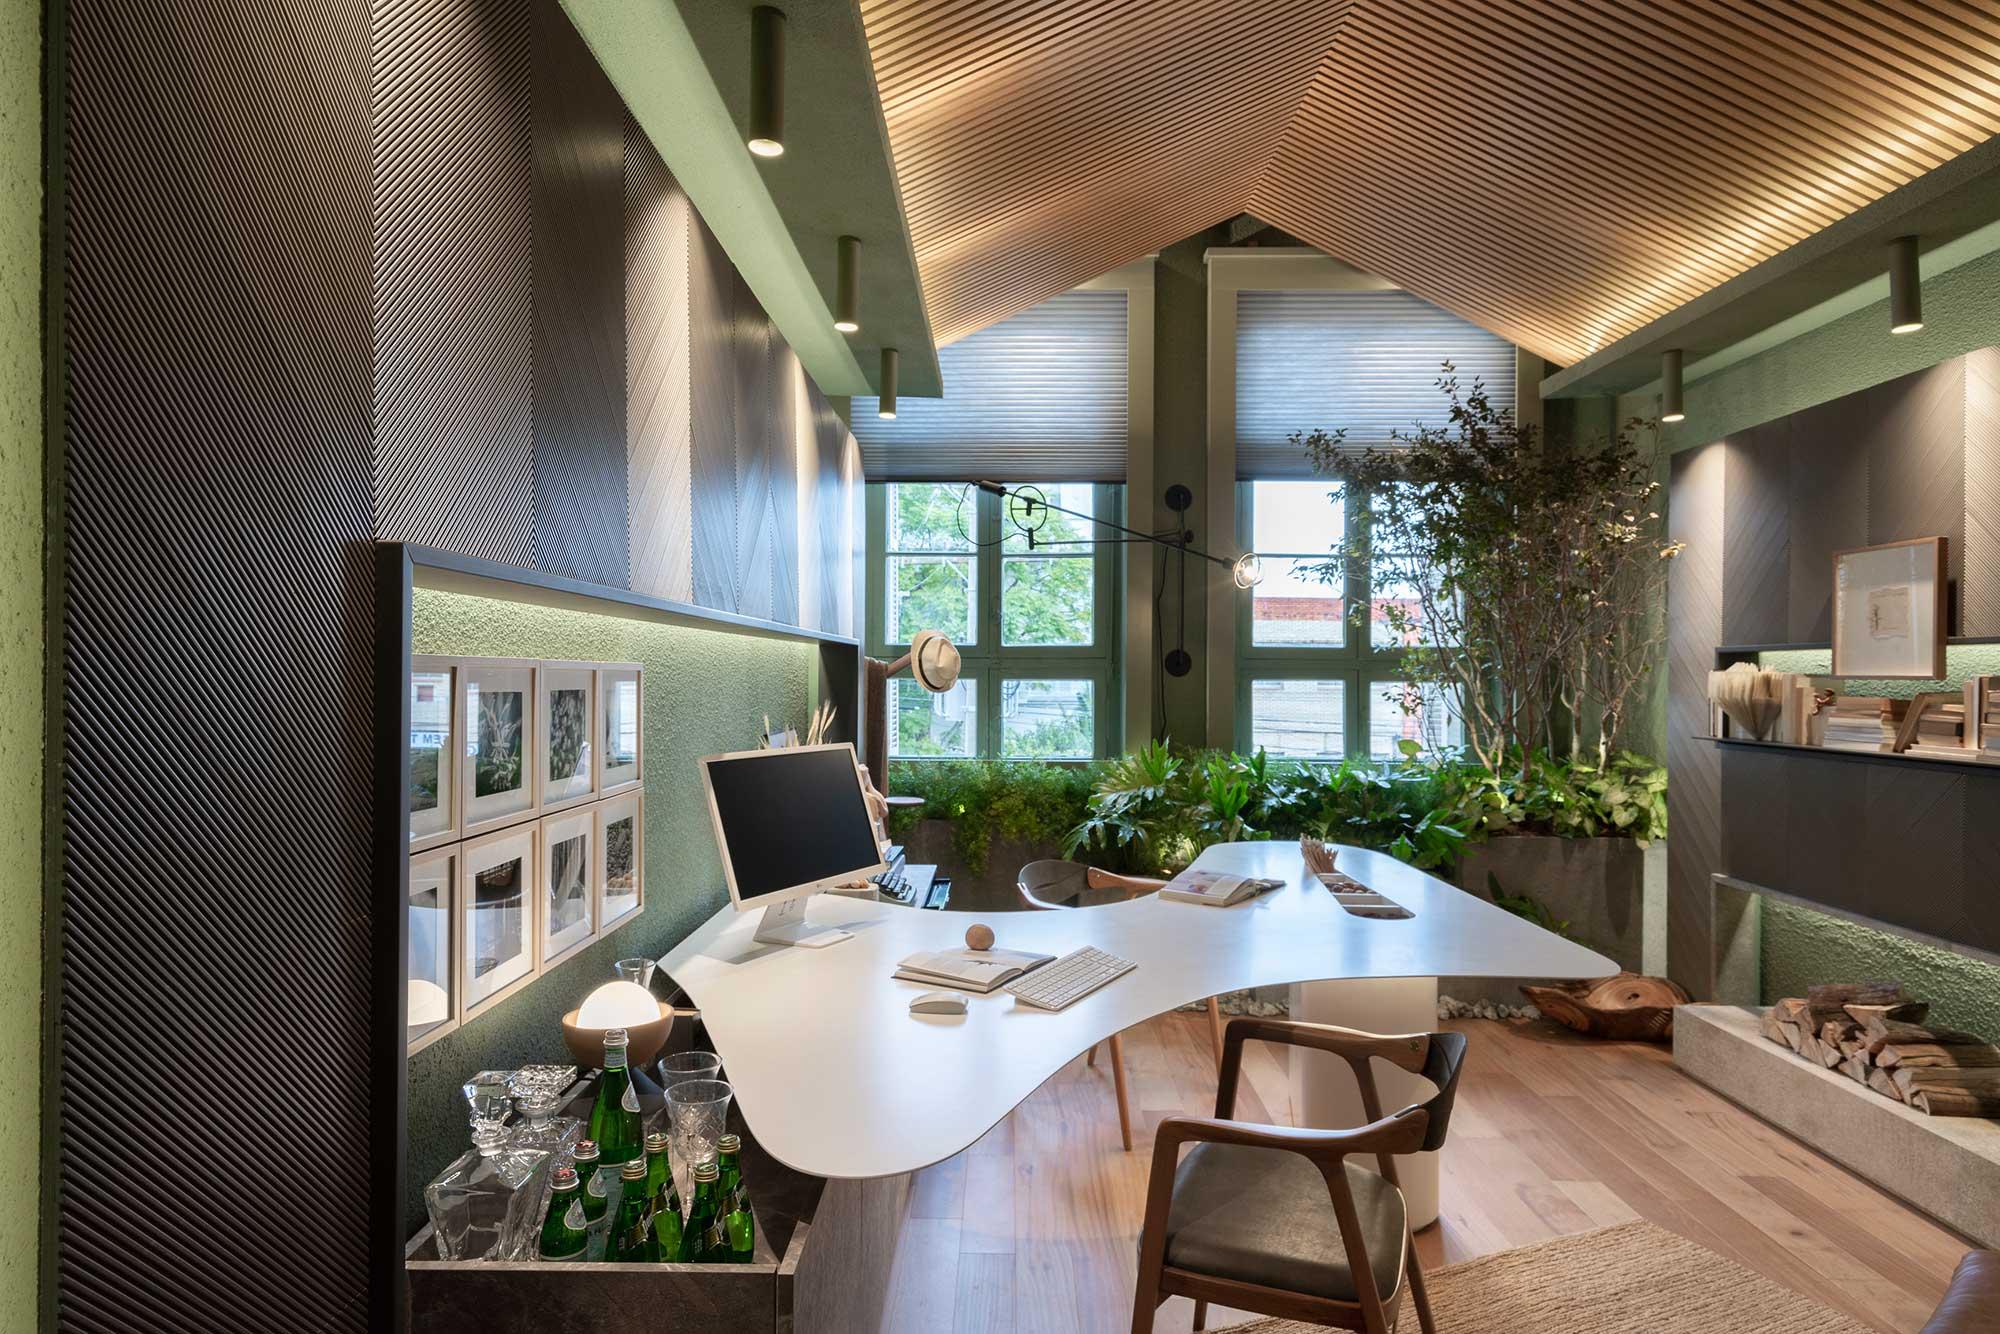 Home office do casal; casacor 2019 urban jungle jardim vertical